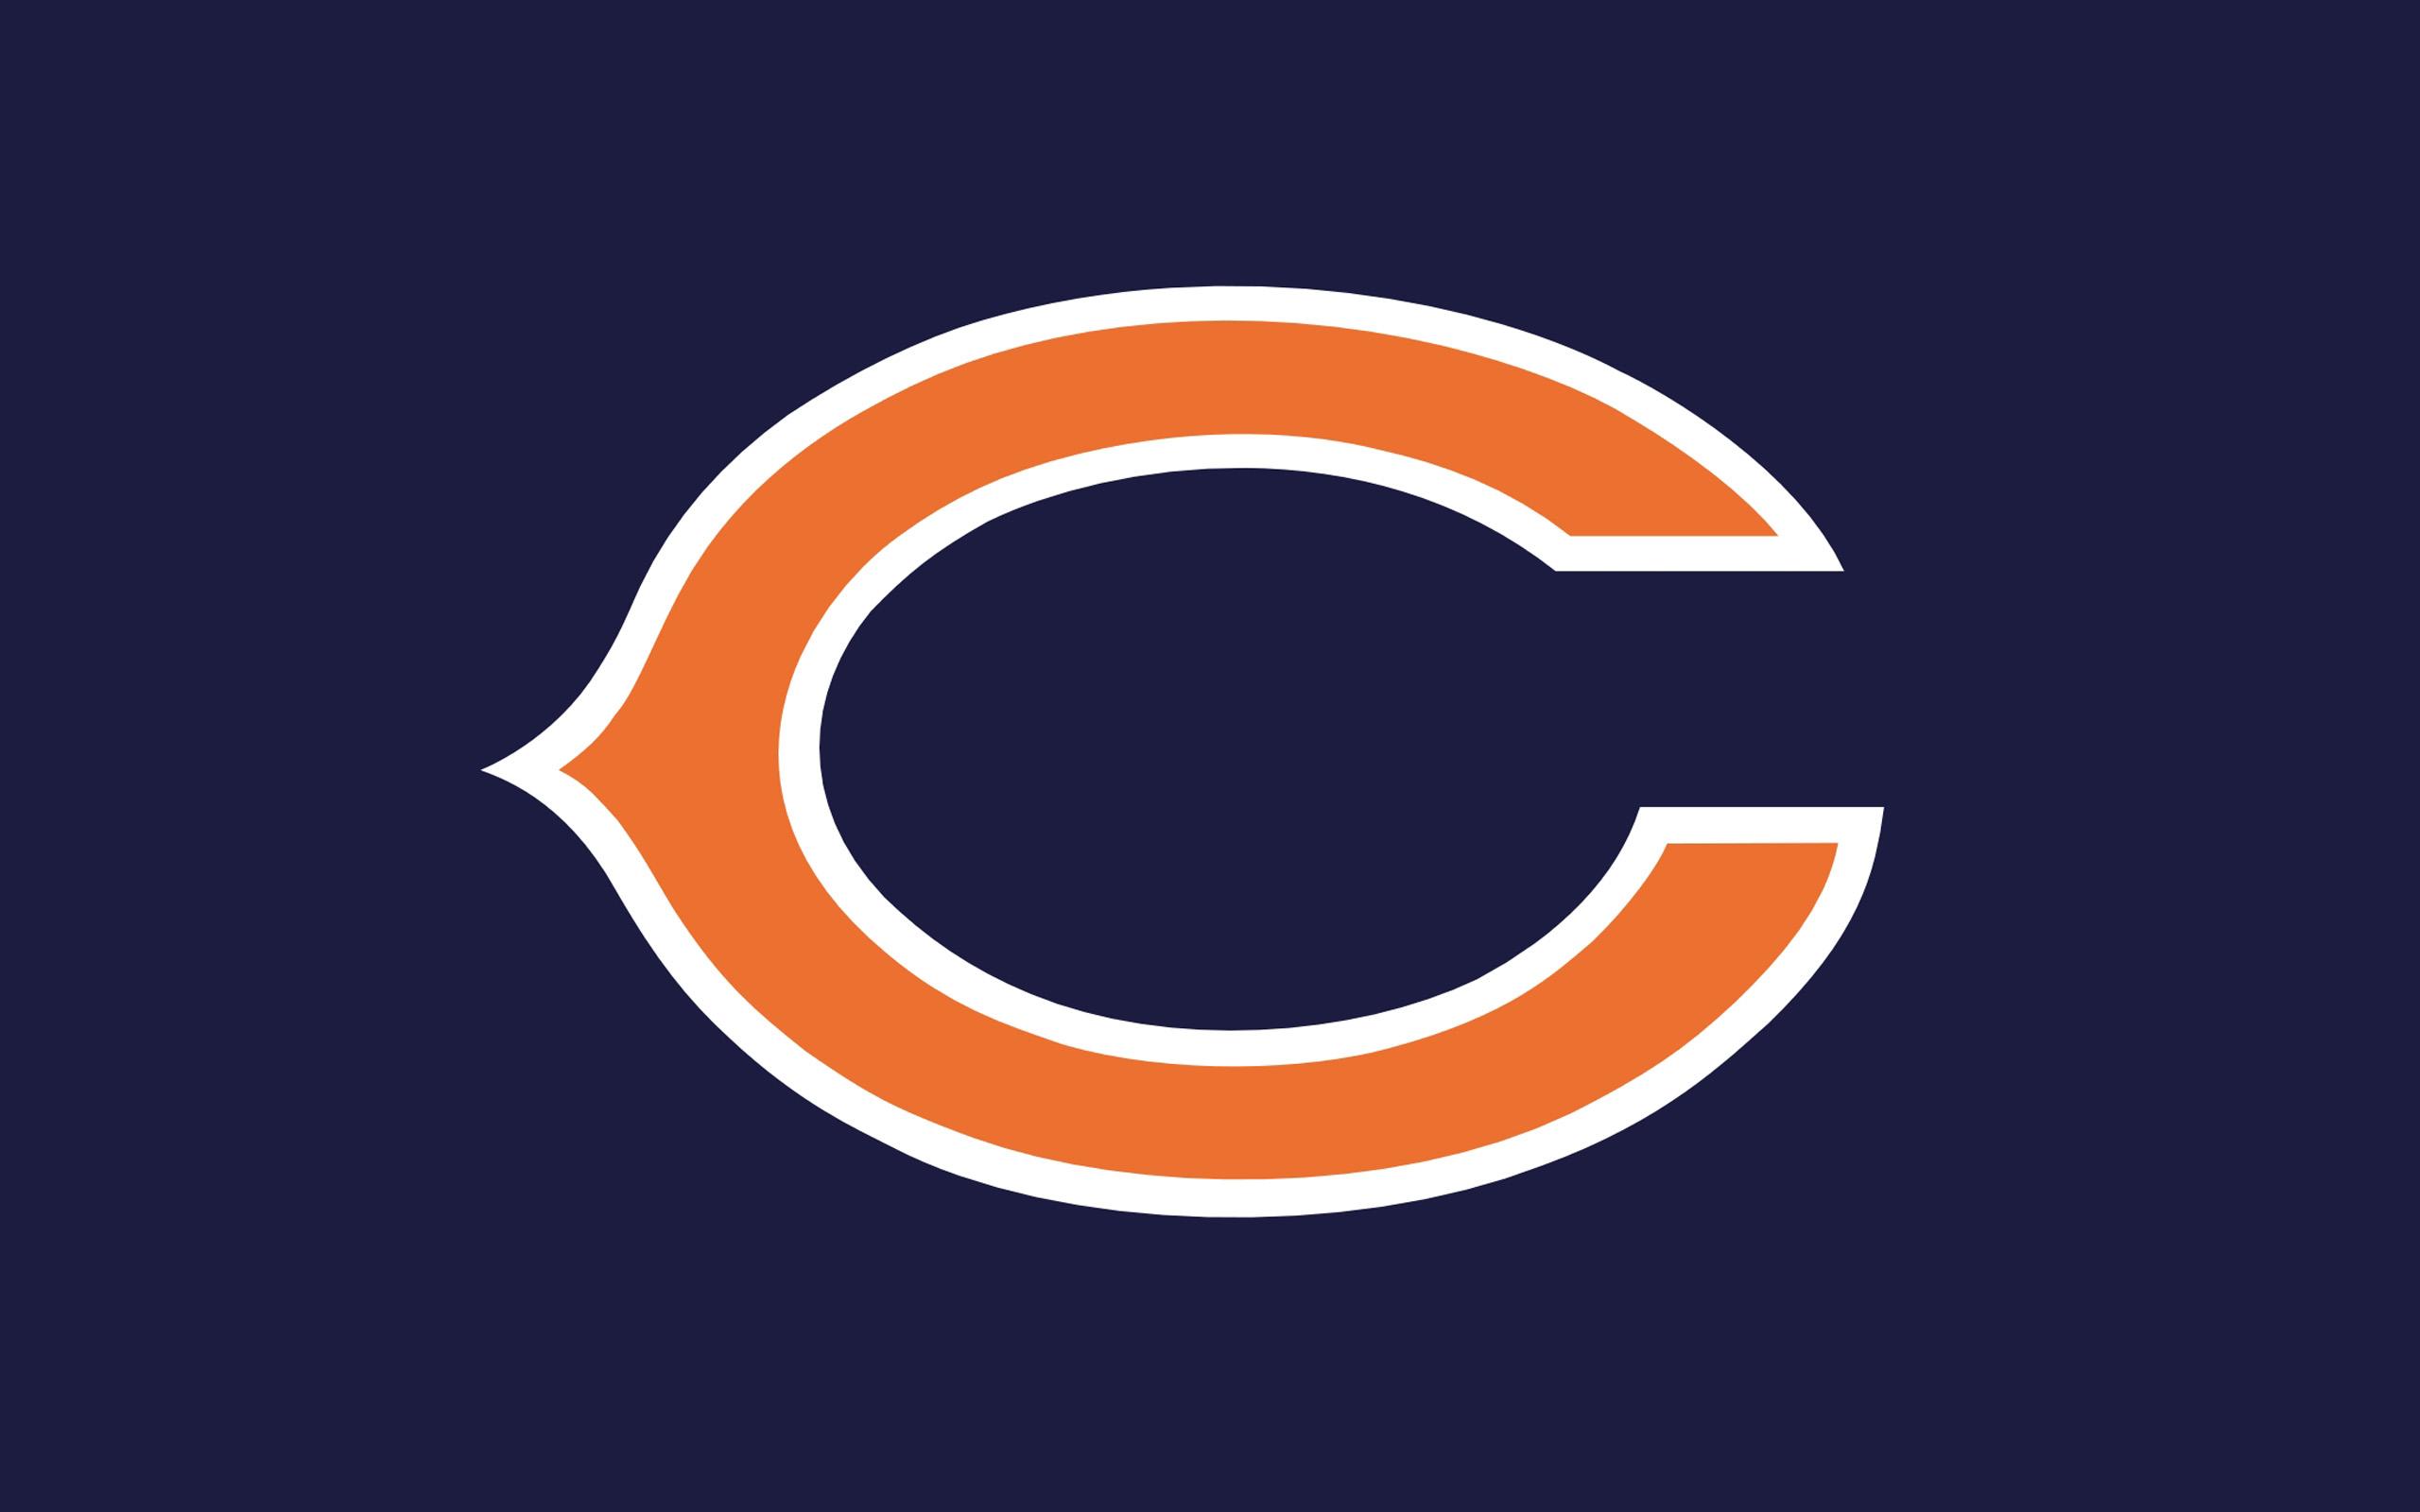 chicago bears - photo #15